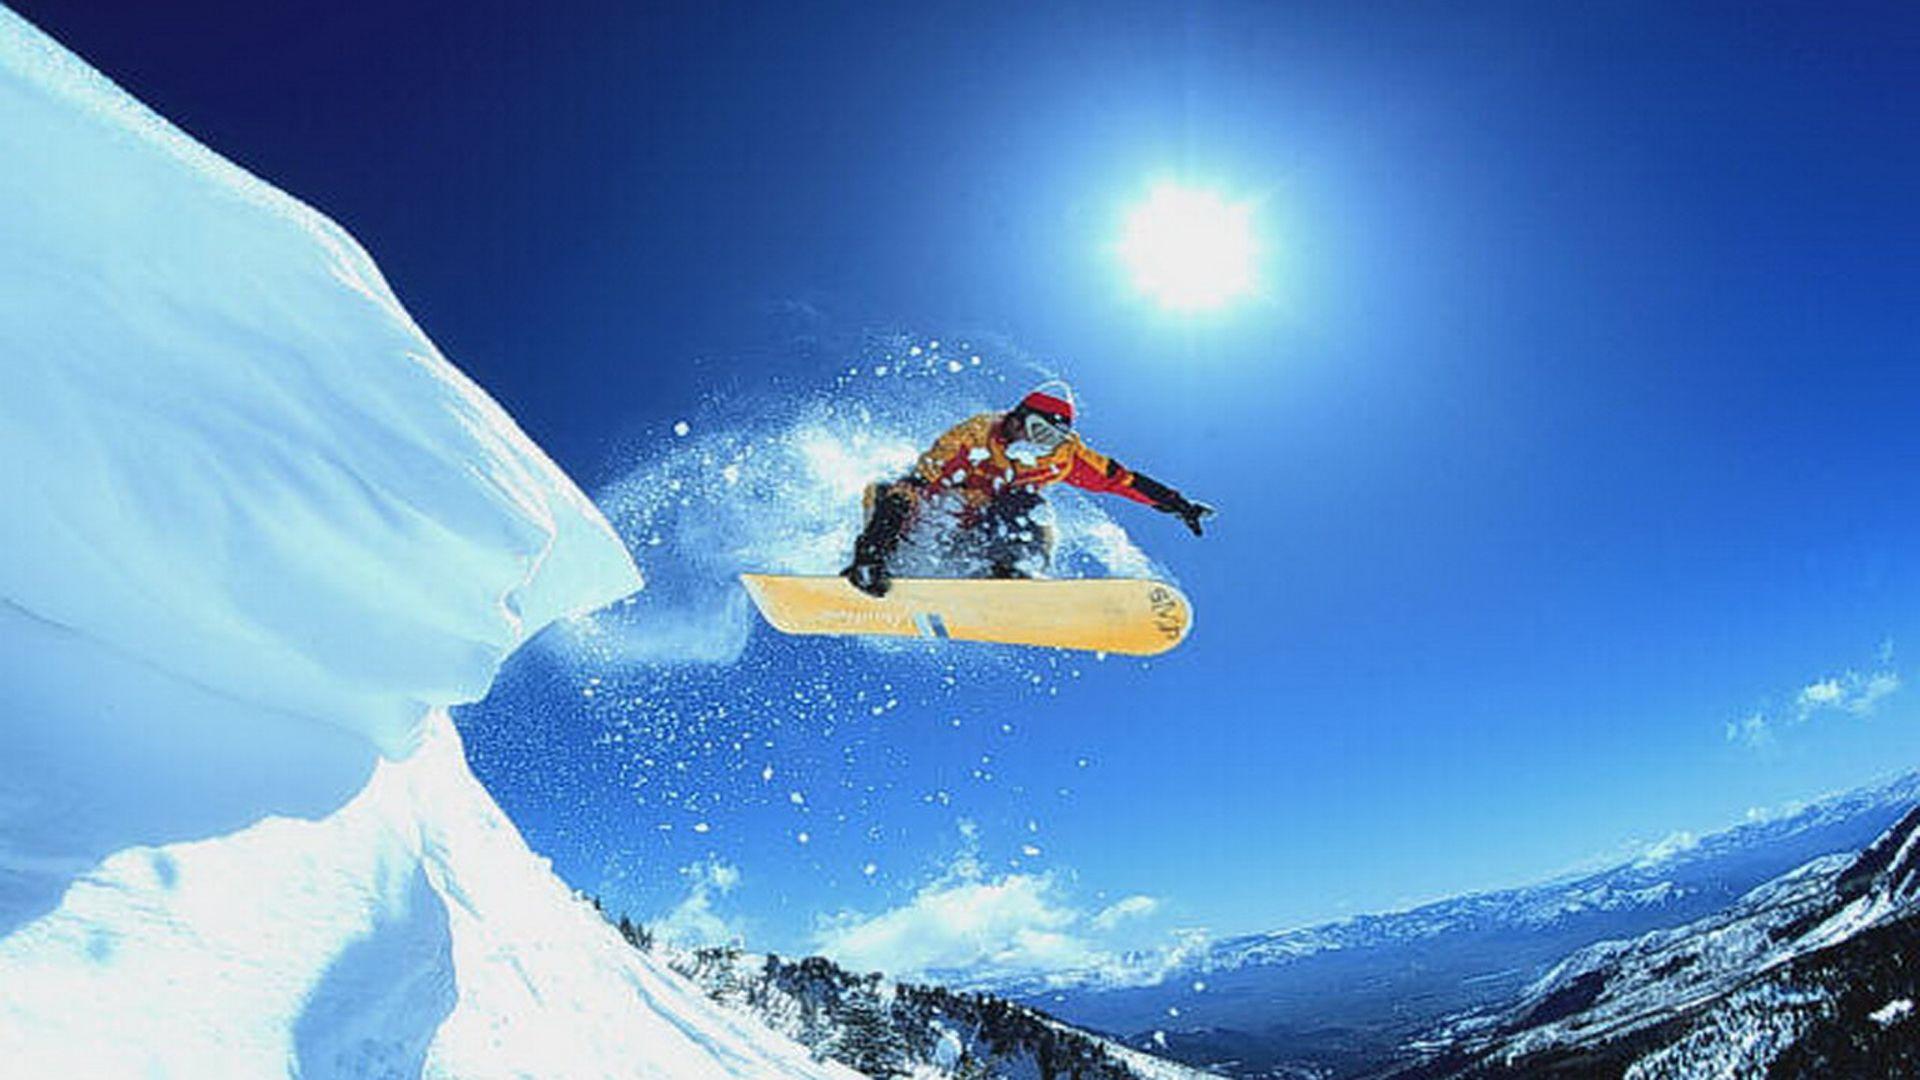 snowboard wallpaper hd  hd snowboarding wallpapers - Google Search | Sports | Pinterest ...